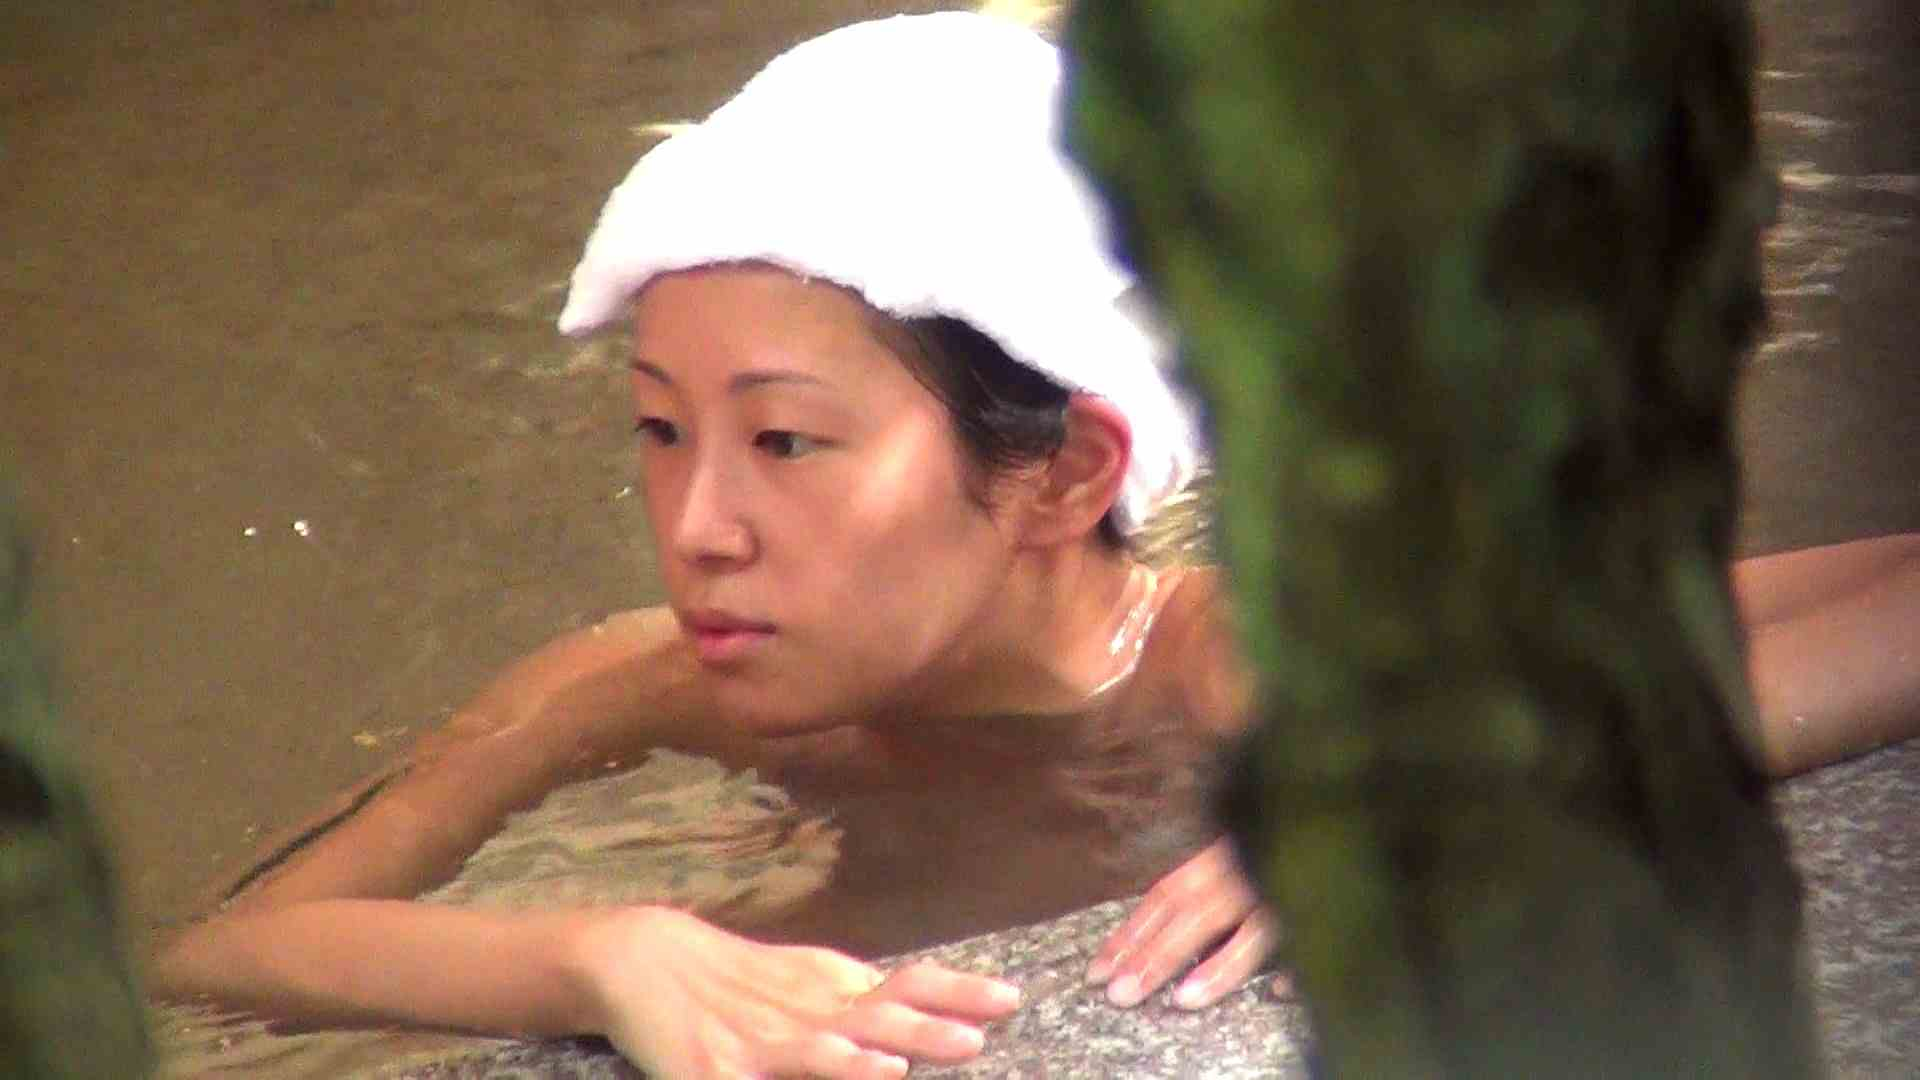 Aquaな露天風呂Vol.281 盗撮大放出 ぱこり動画紹介 60連発 43